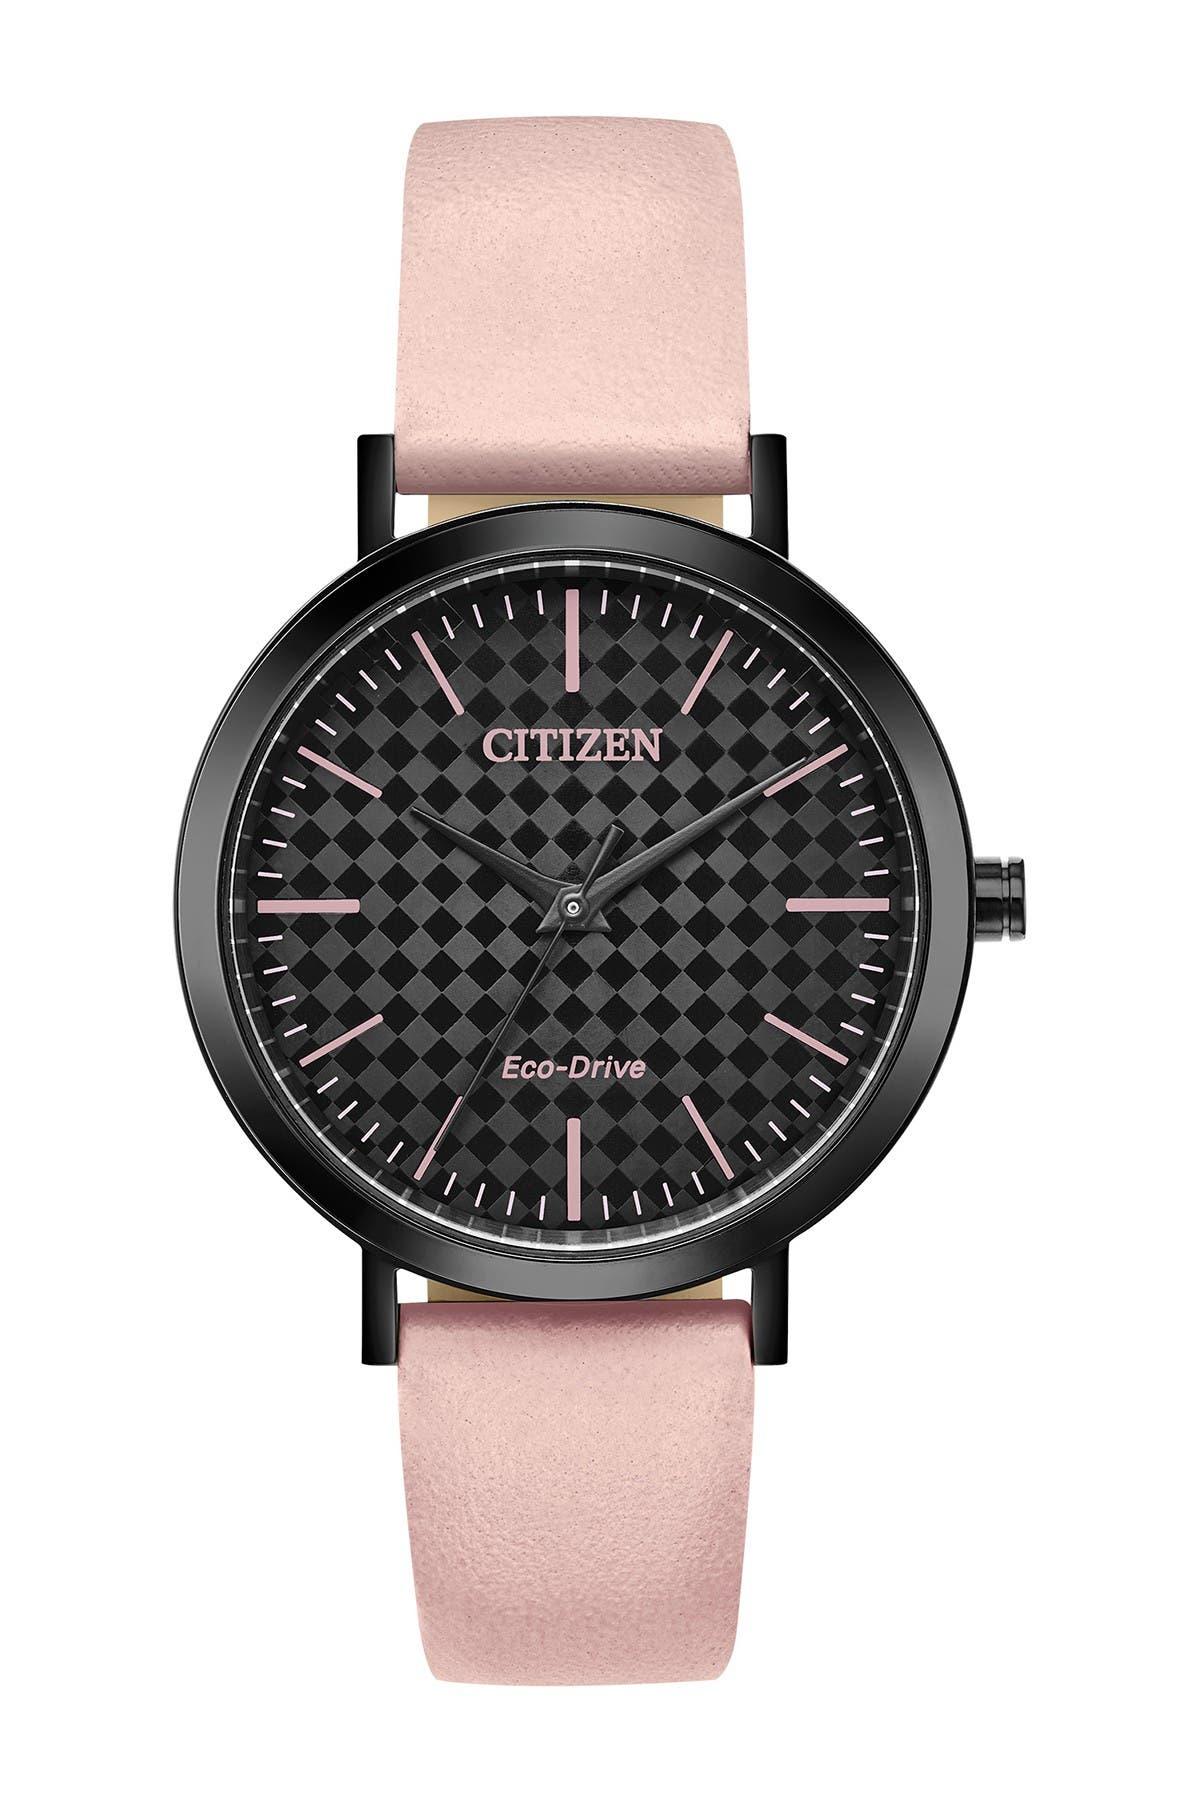 Image of Citizen Women's Drive Blush Strap Watch, 36.5mm